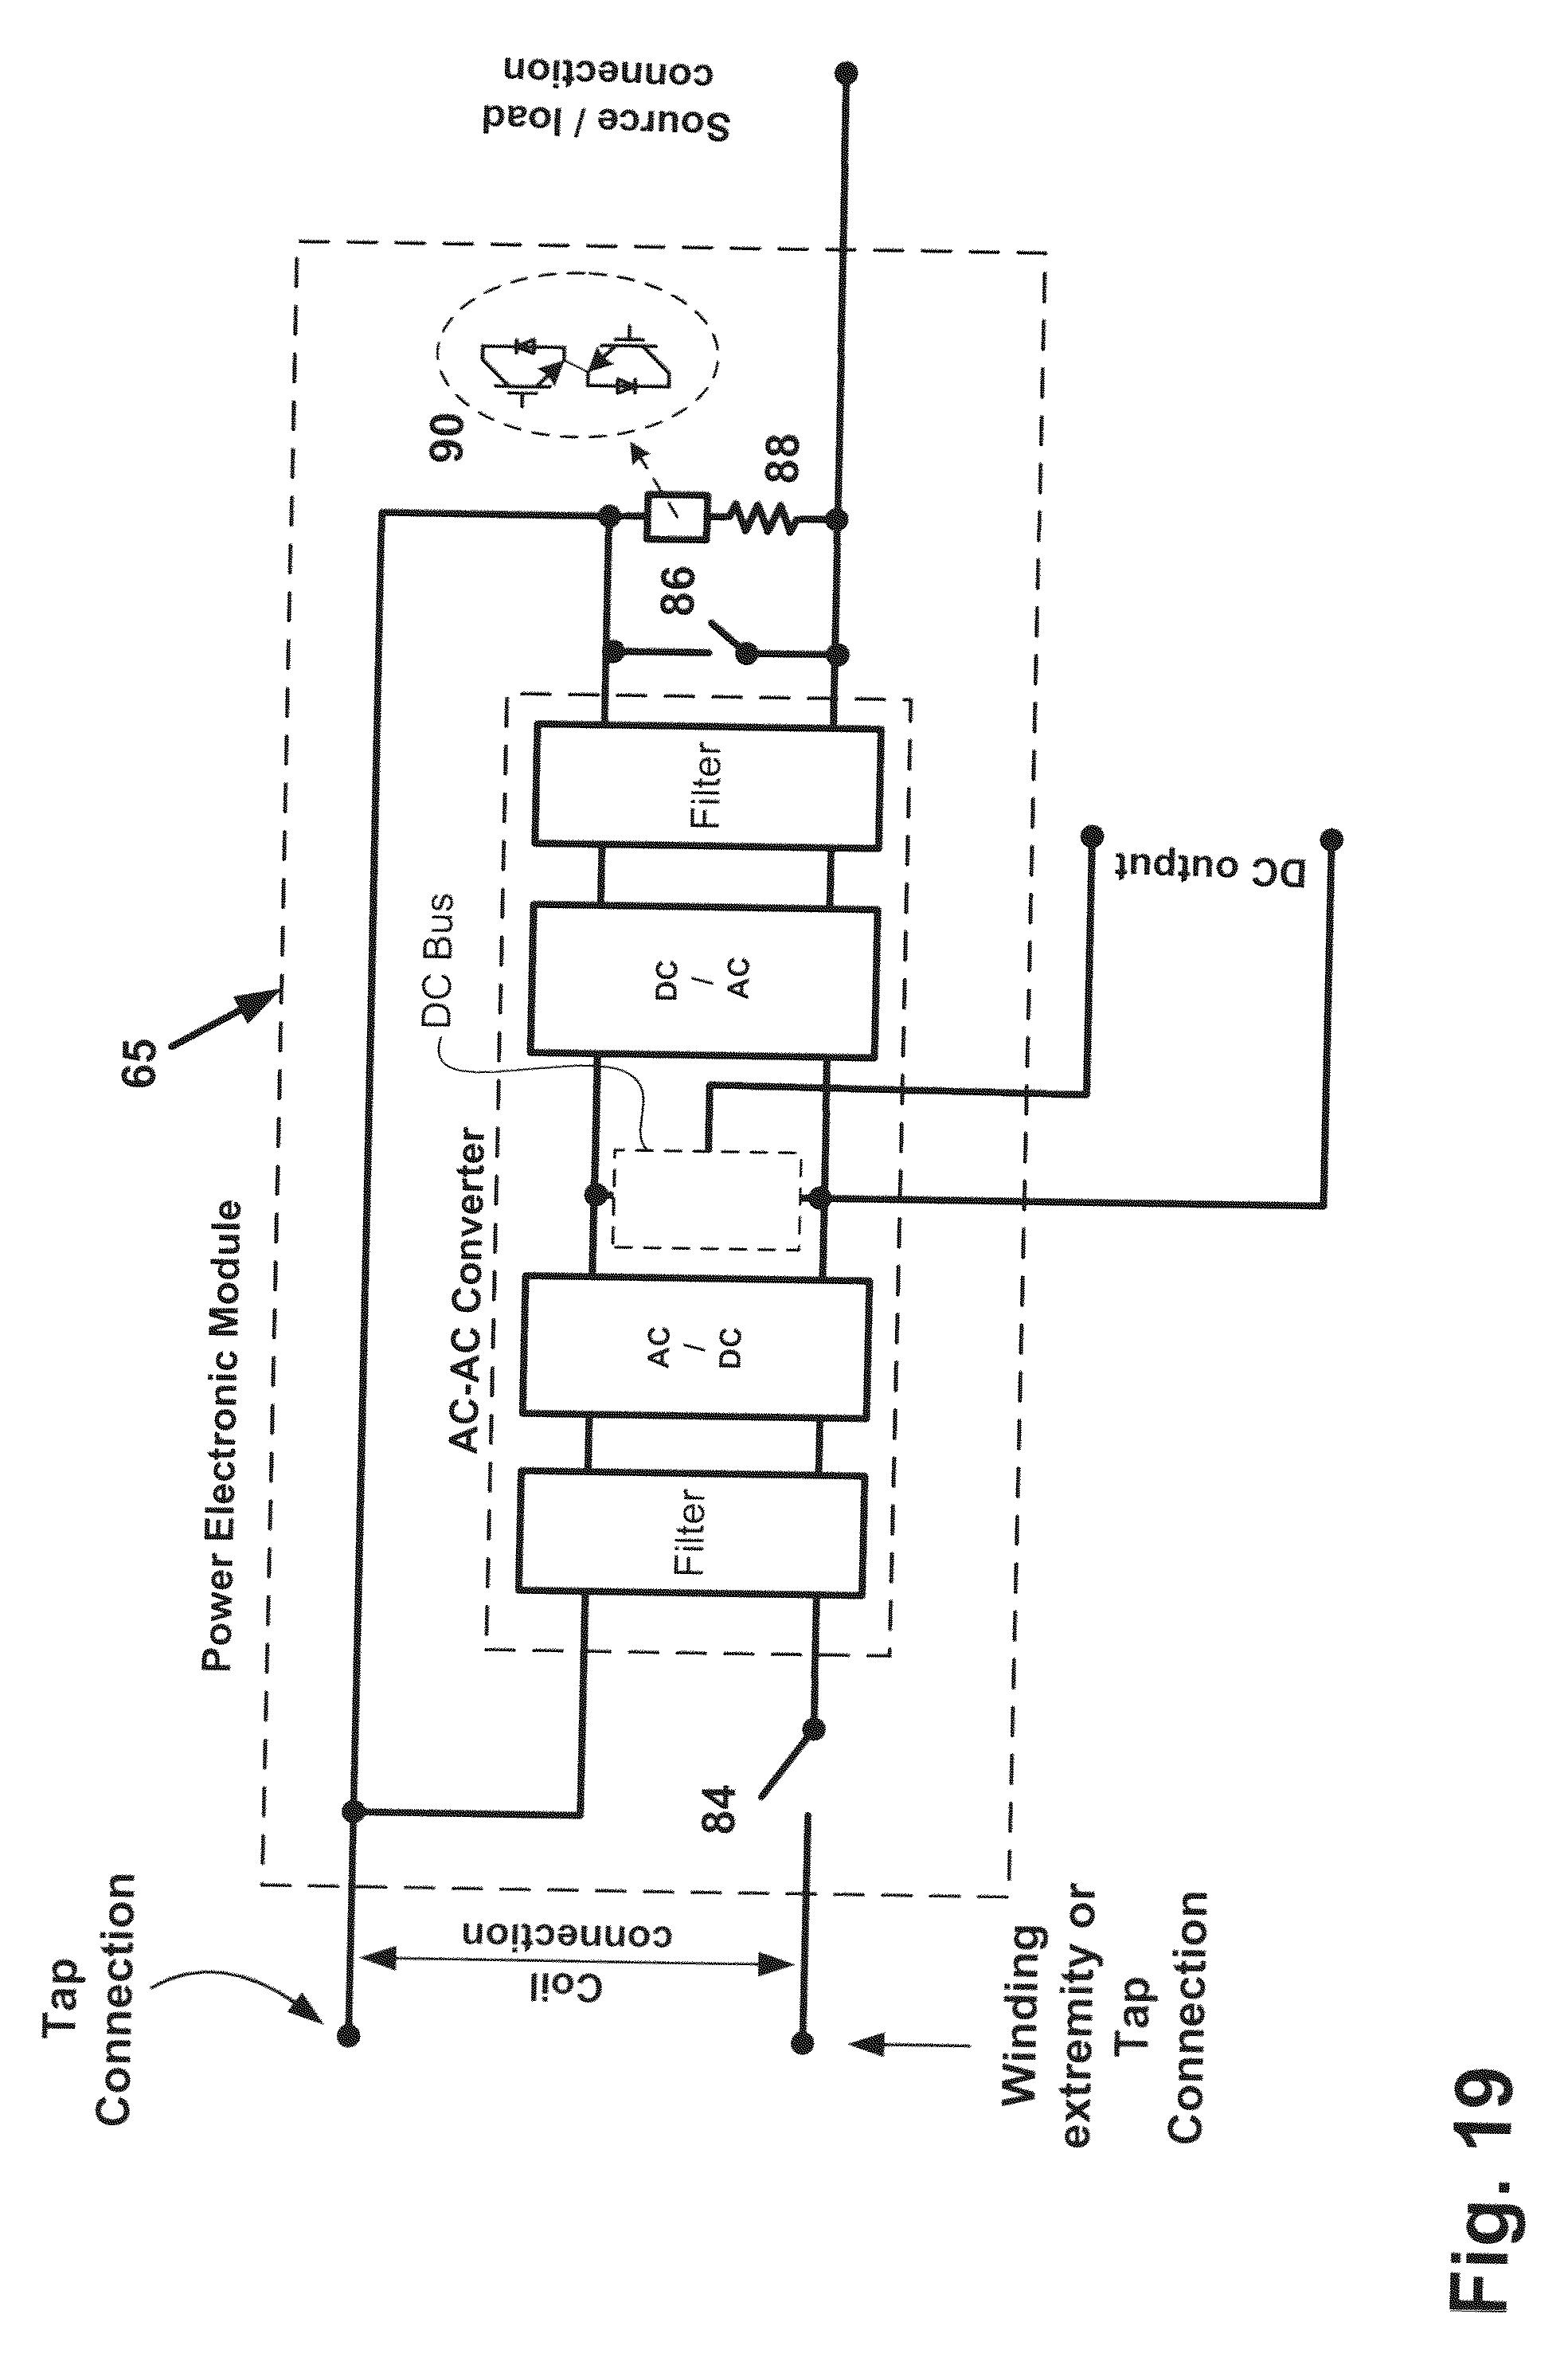 G3 Boat Wiring Diagrams Schematics Trusted Pontoon Diagram Mercury Xr6 Caravelle Deck